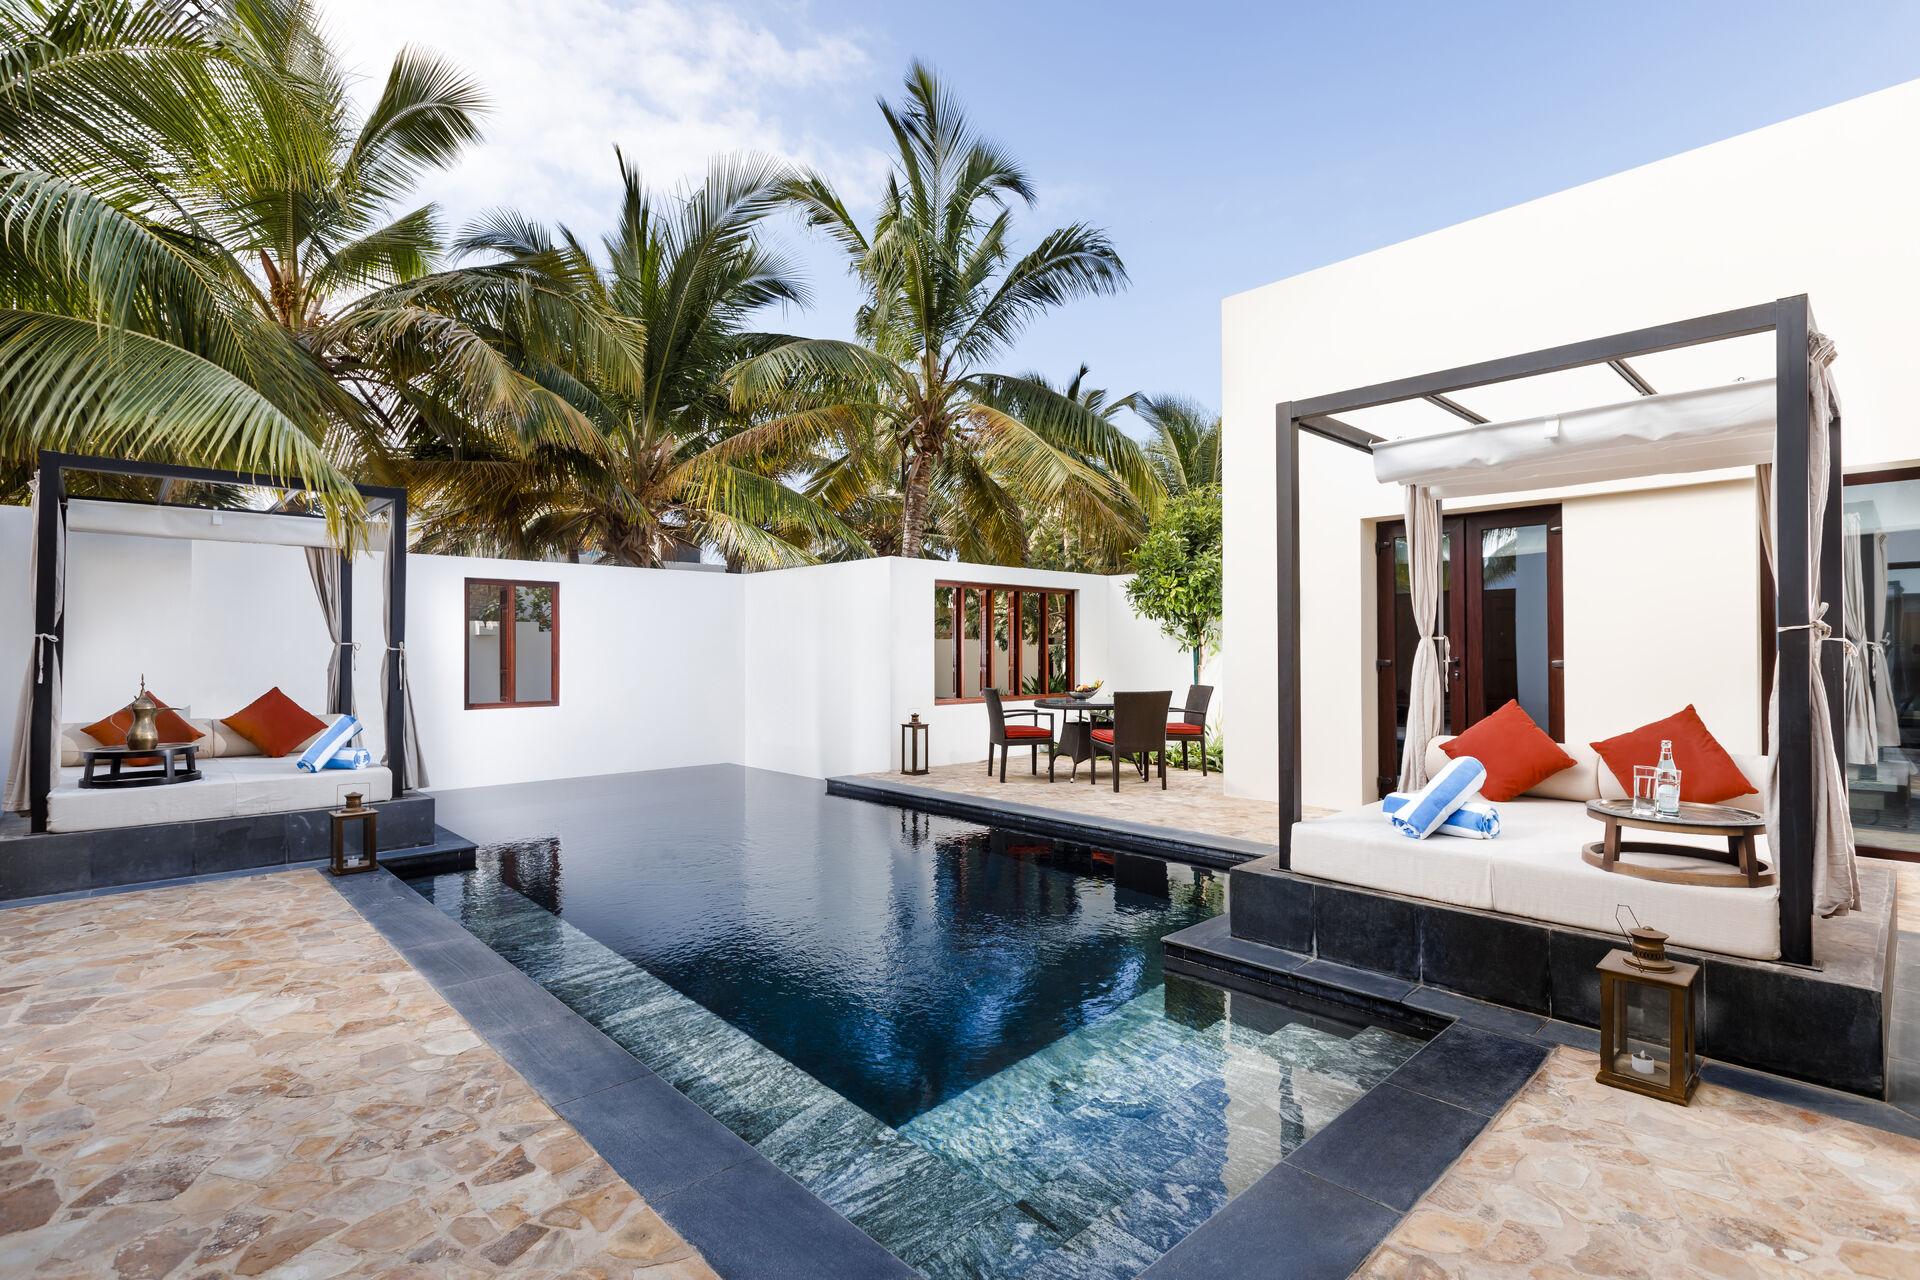 https://cms.satur.sk/data/imgs/tour_image/orig/two-bedroom-garden-view-pool-villa-2-1939940.jpg